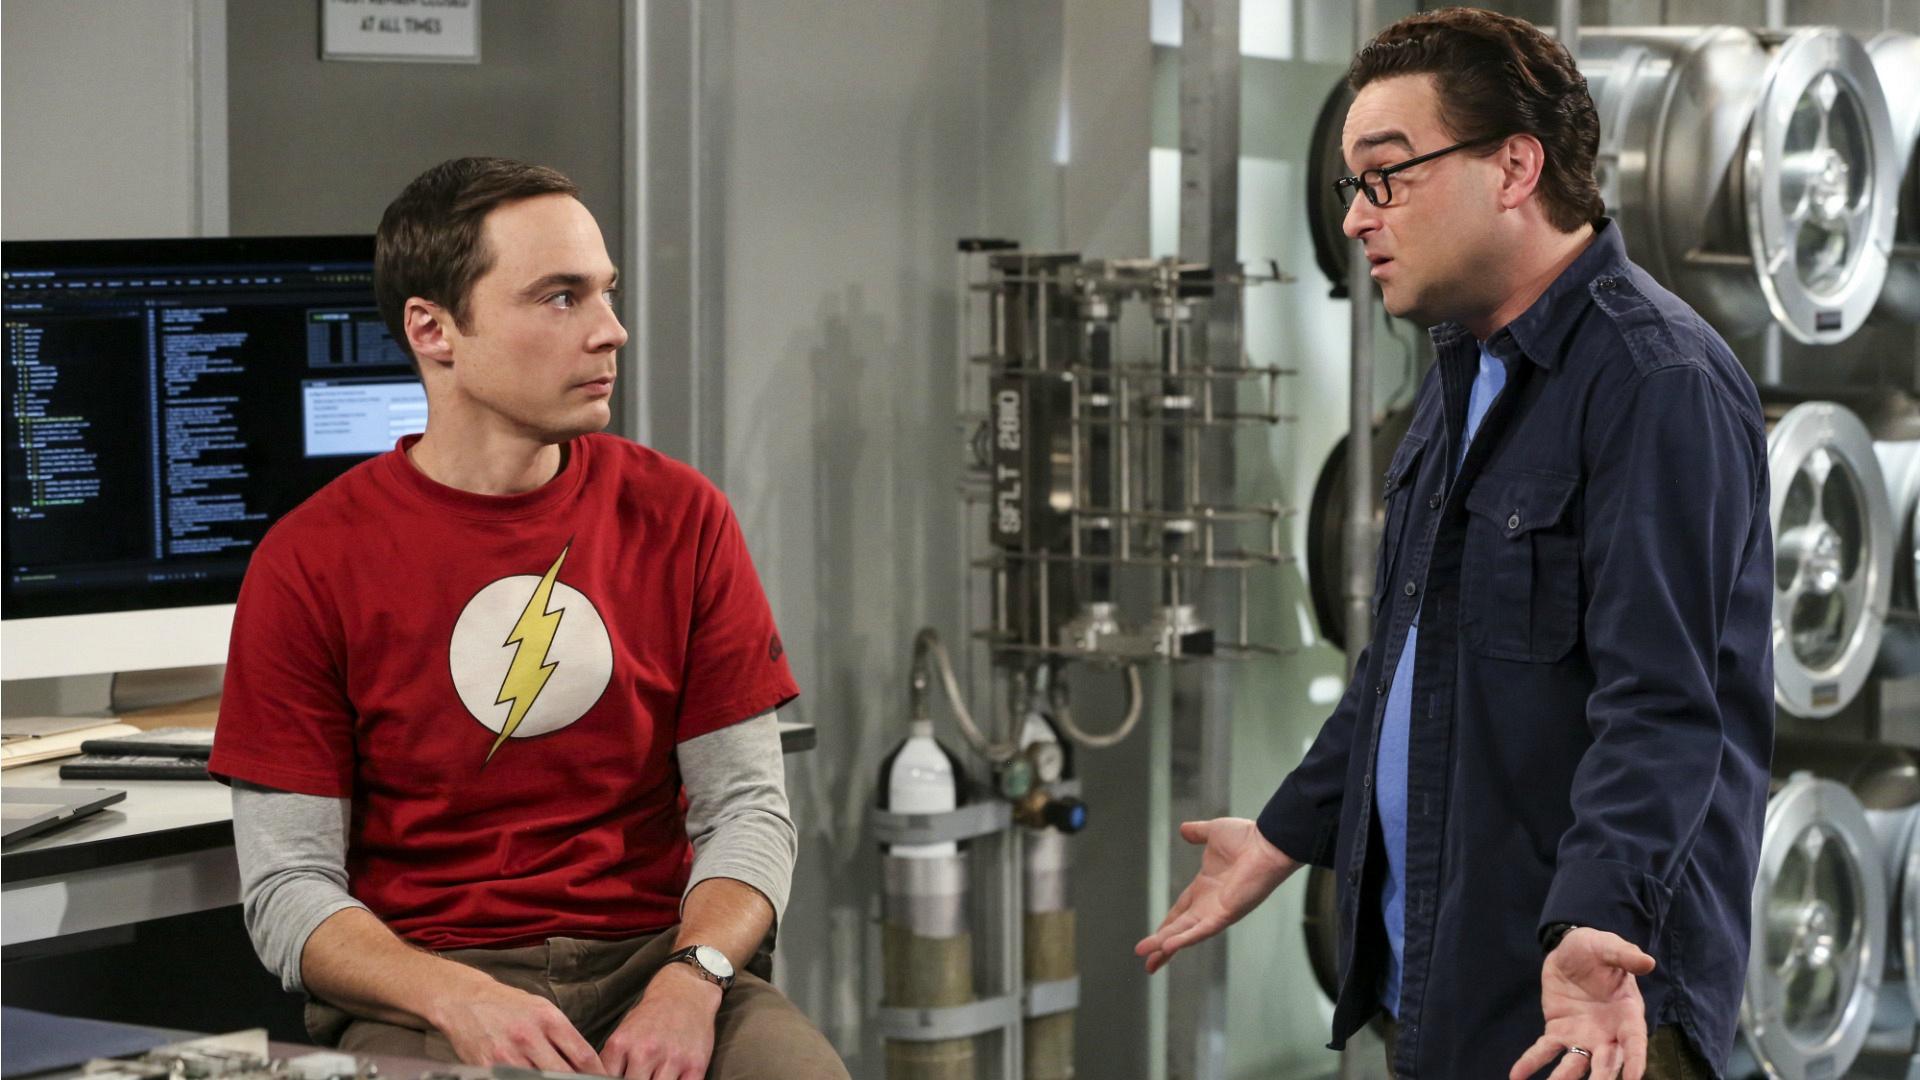 Leonard tries to reason with Sheldon.